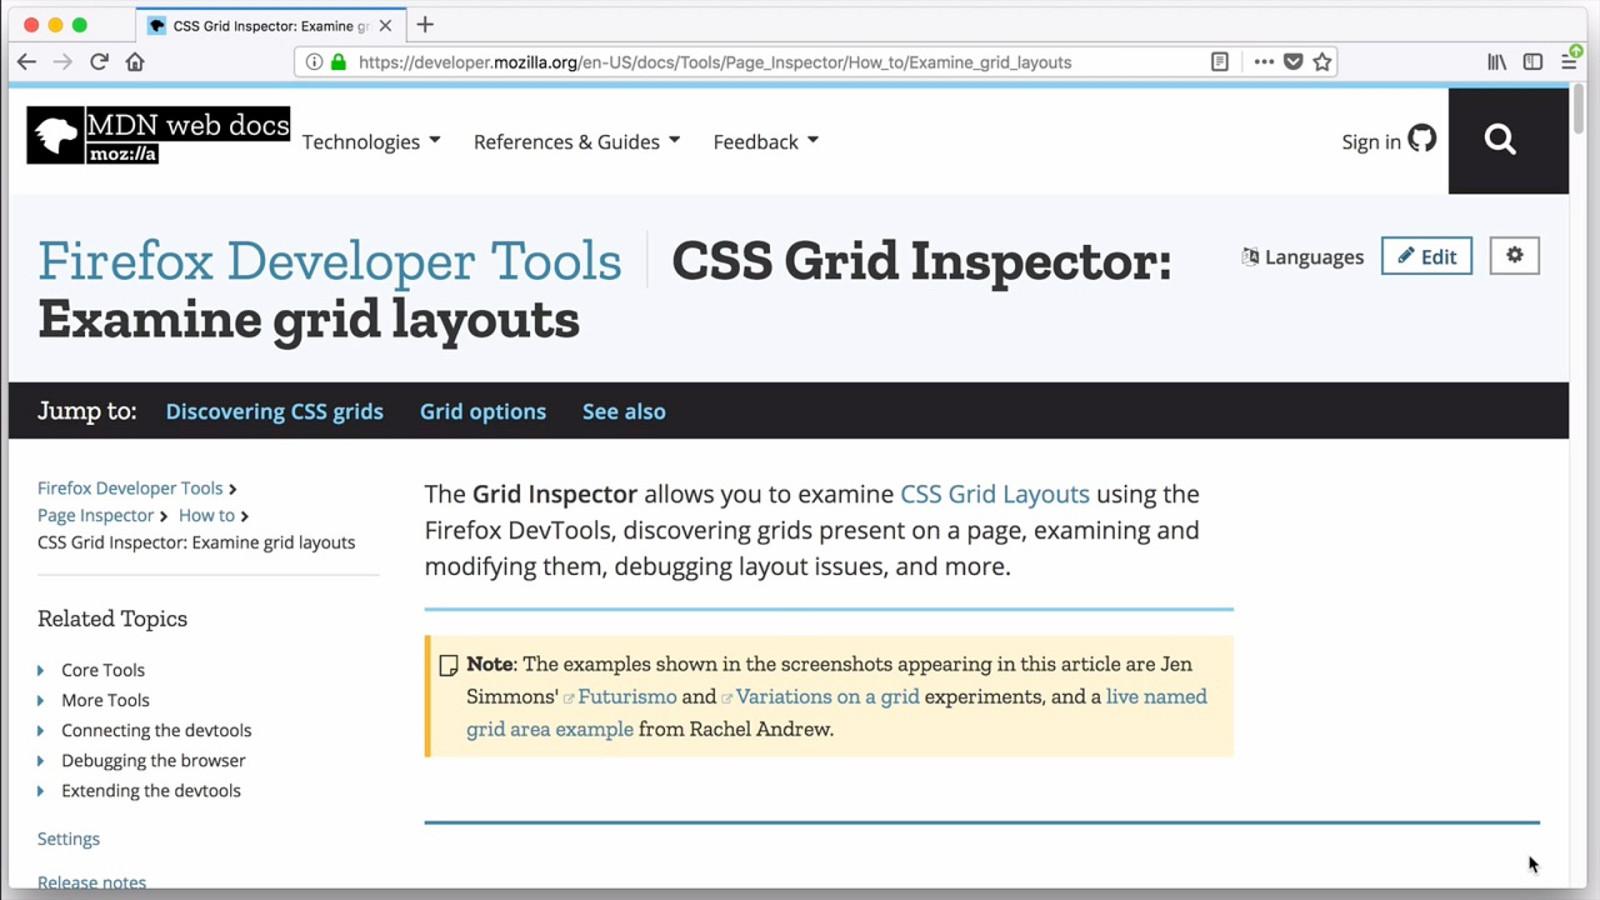 Groundbreaking new tools for web typographers